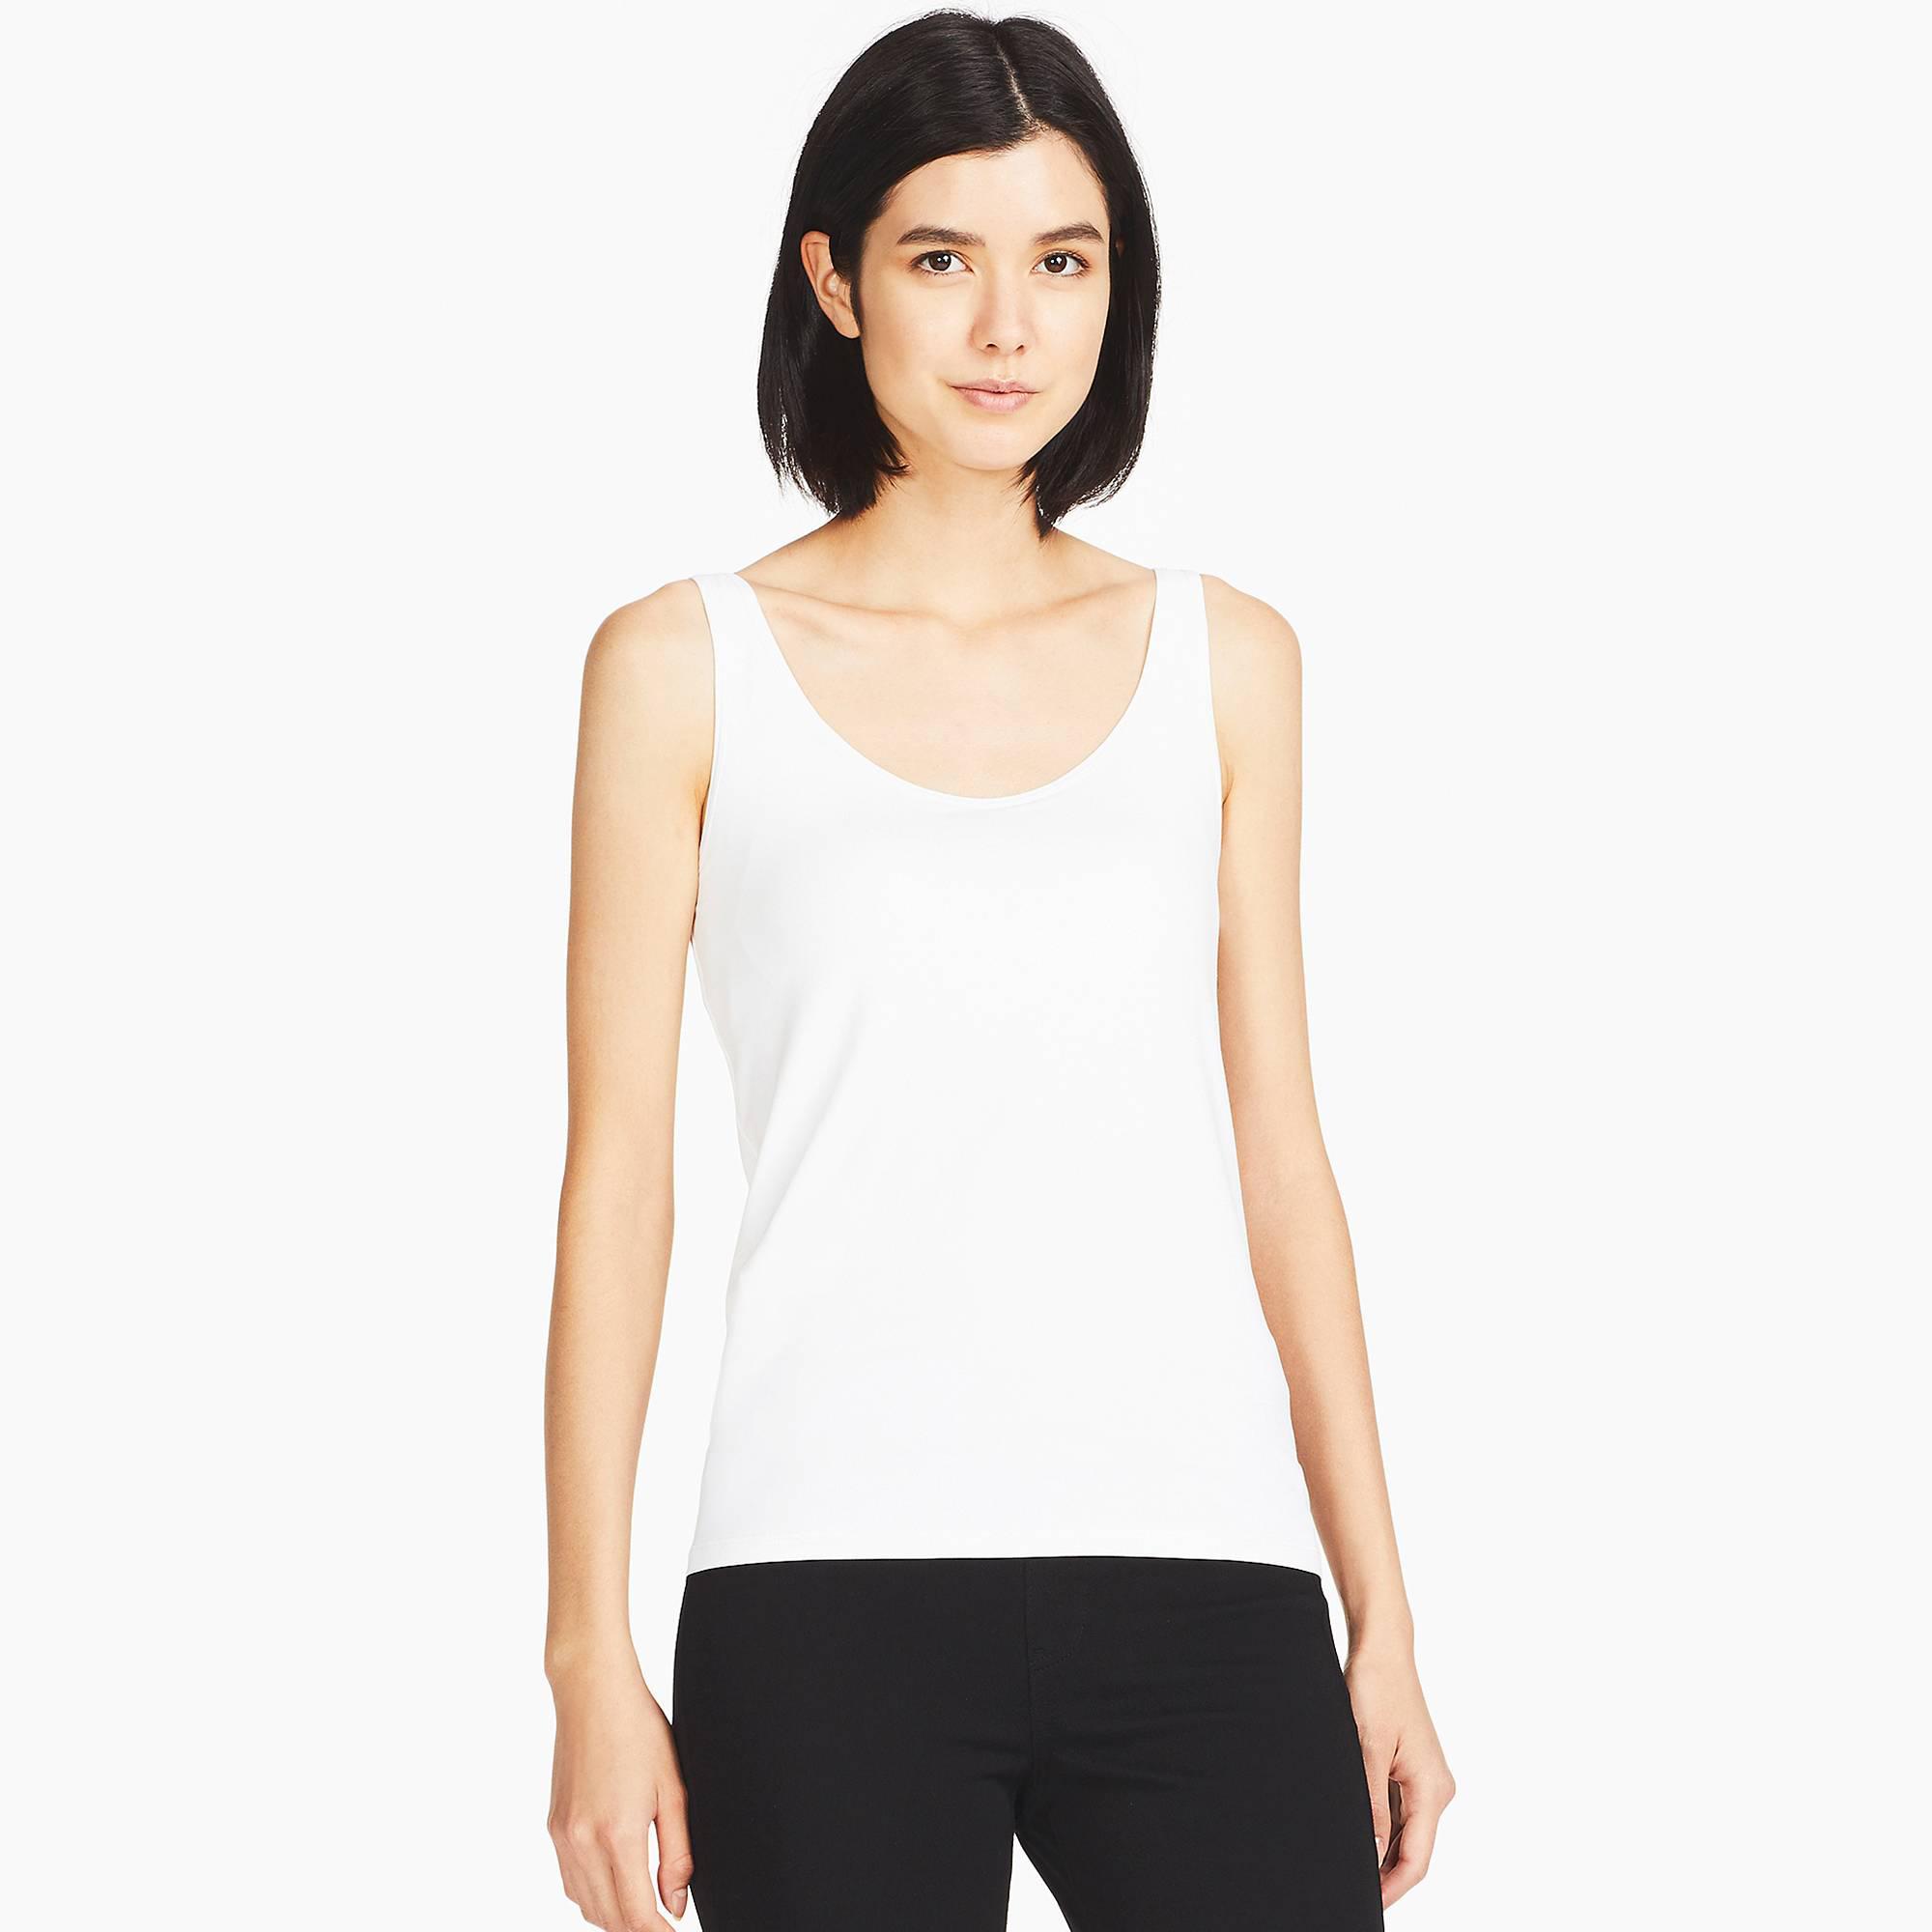 b14818618a401 Lyst - Uniqlo Women Airism Bra Sleeveless Top in White